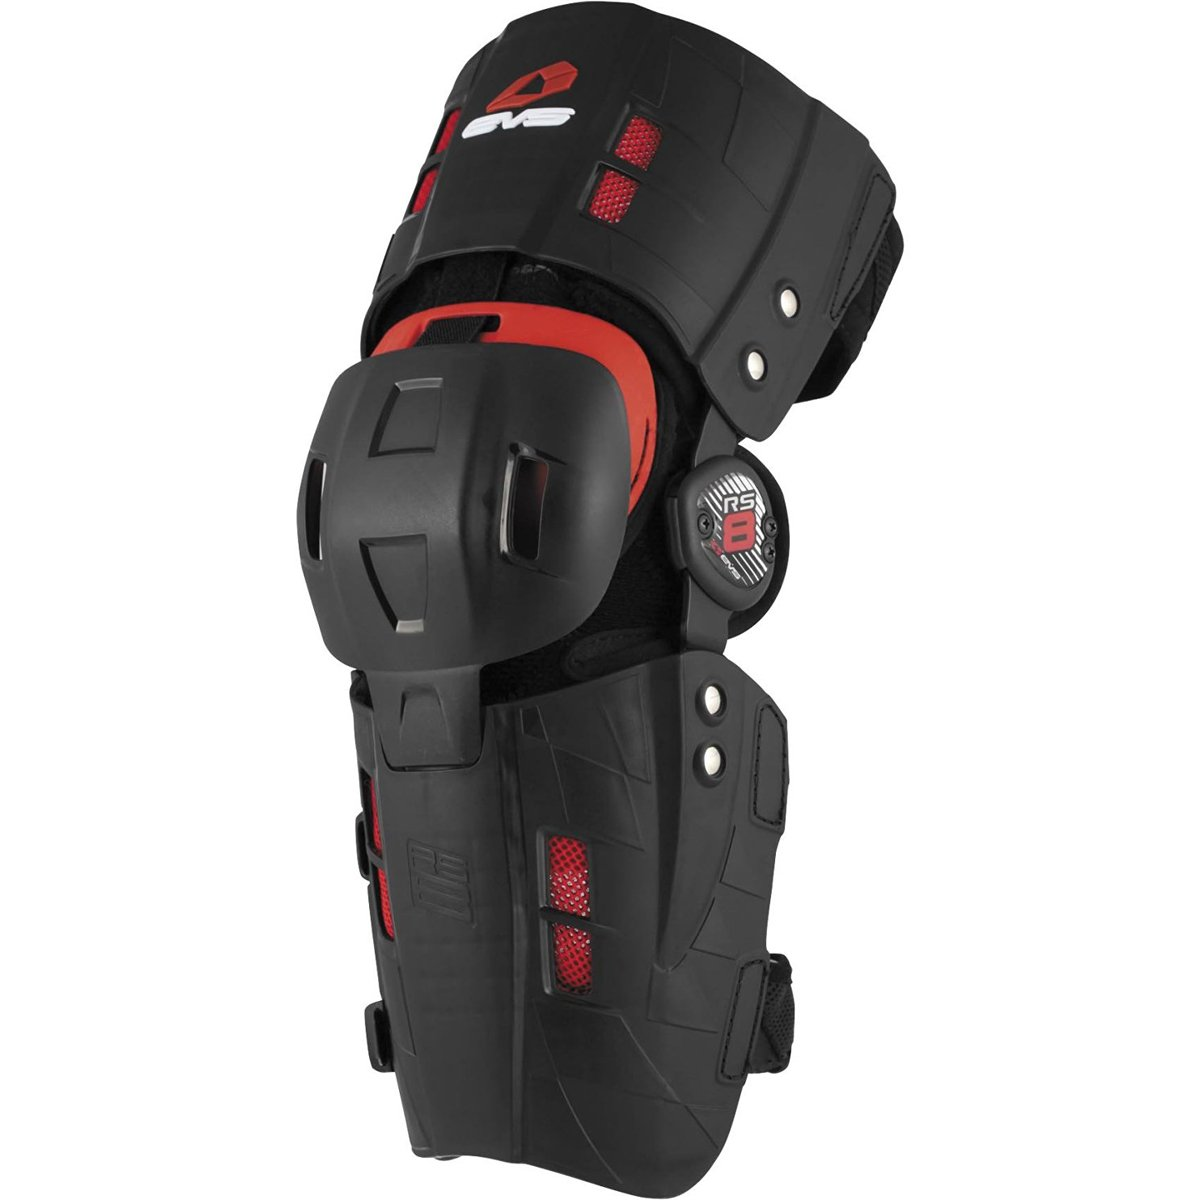 EVS RS-8 Knee Brace - Left , Distinct Name: Black, Size: XL, Primary Color: Black, Gender: Mens/Unisex RS8-XL